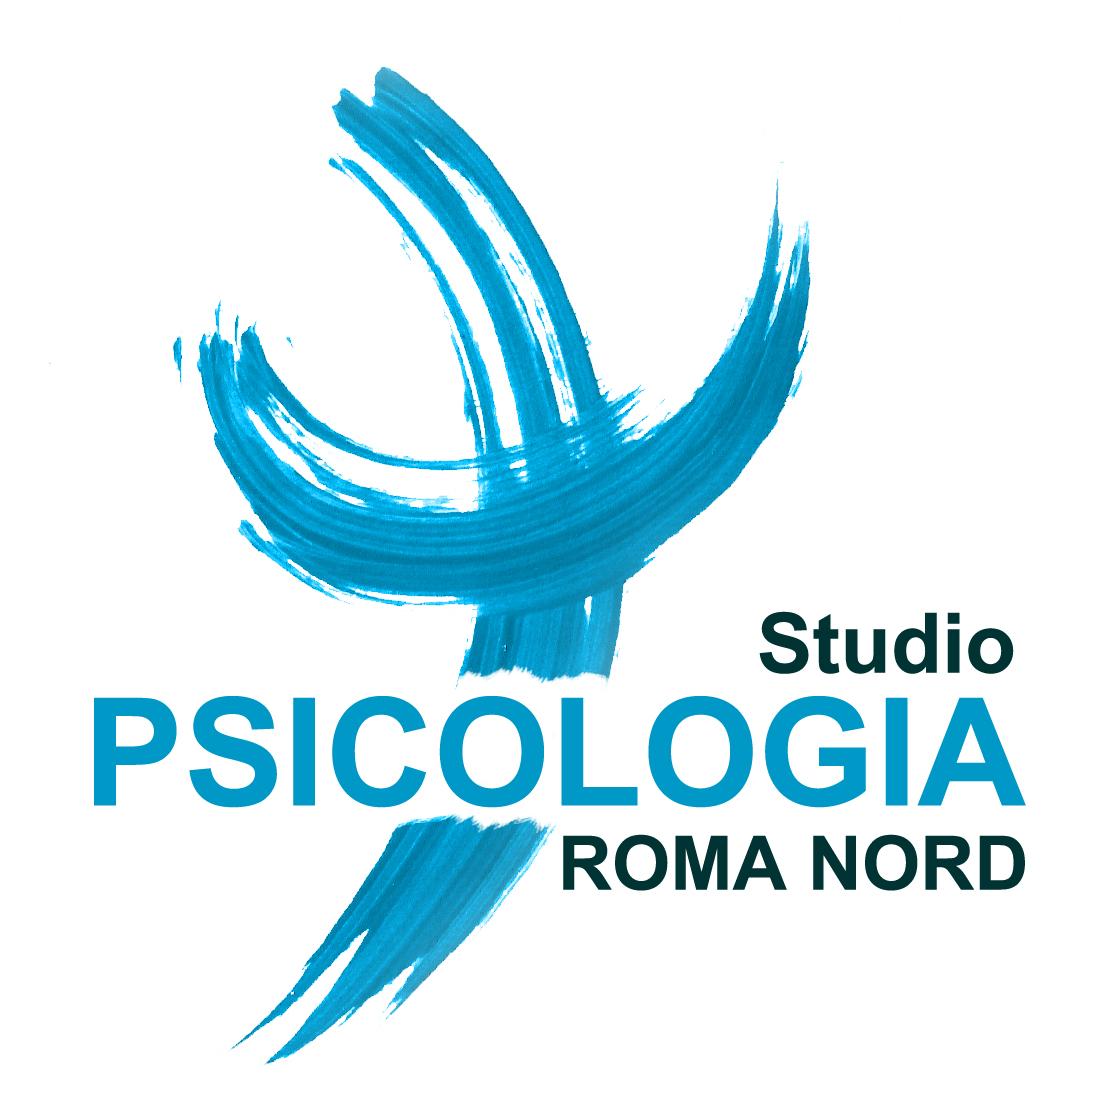 psicologiaromanord.it